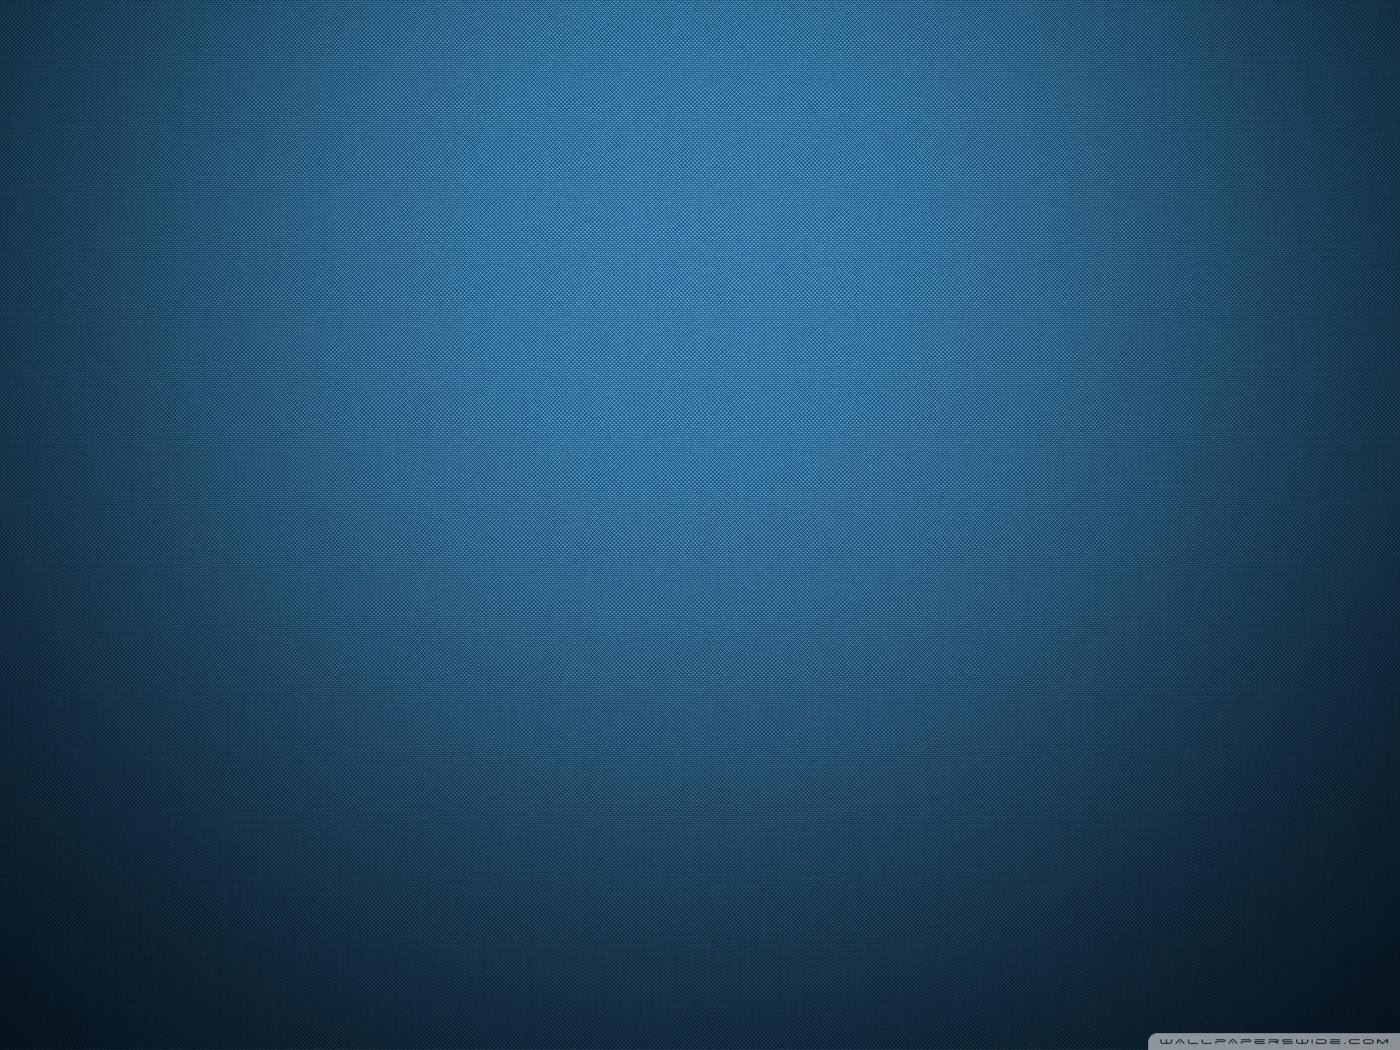 Unduh 76+ Background Blue Wallpaper Terbaik